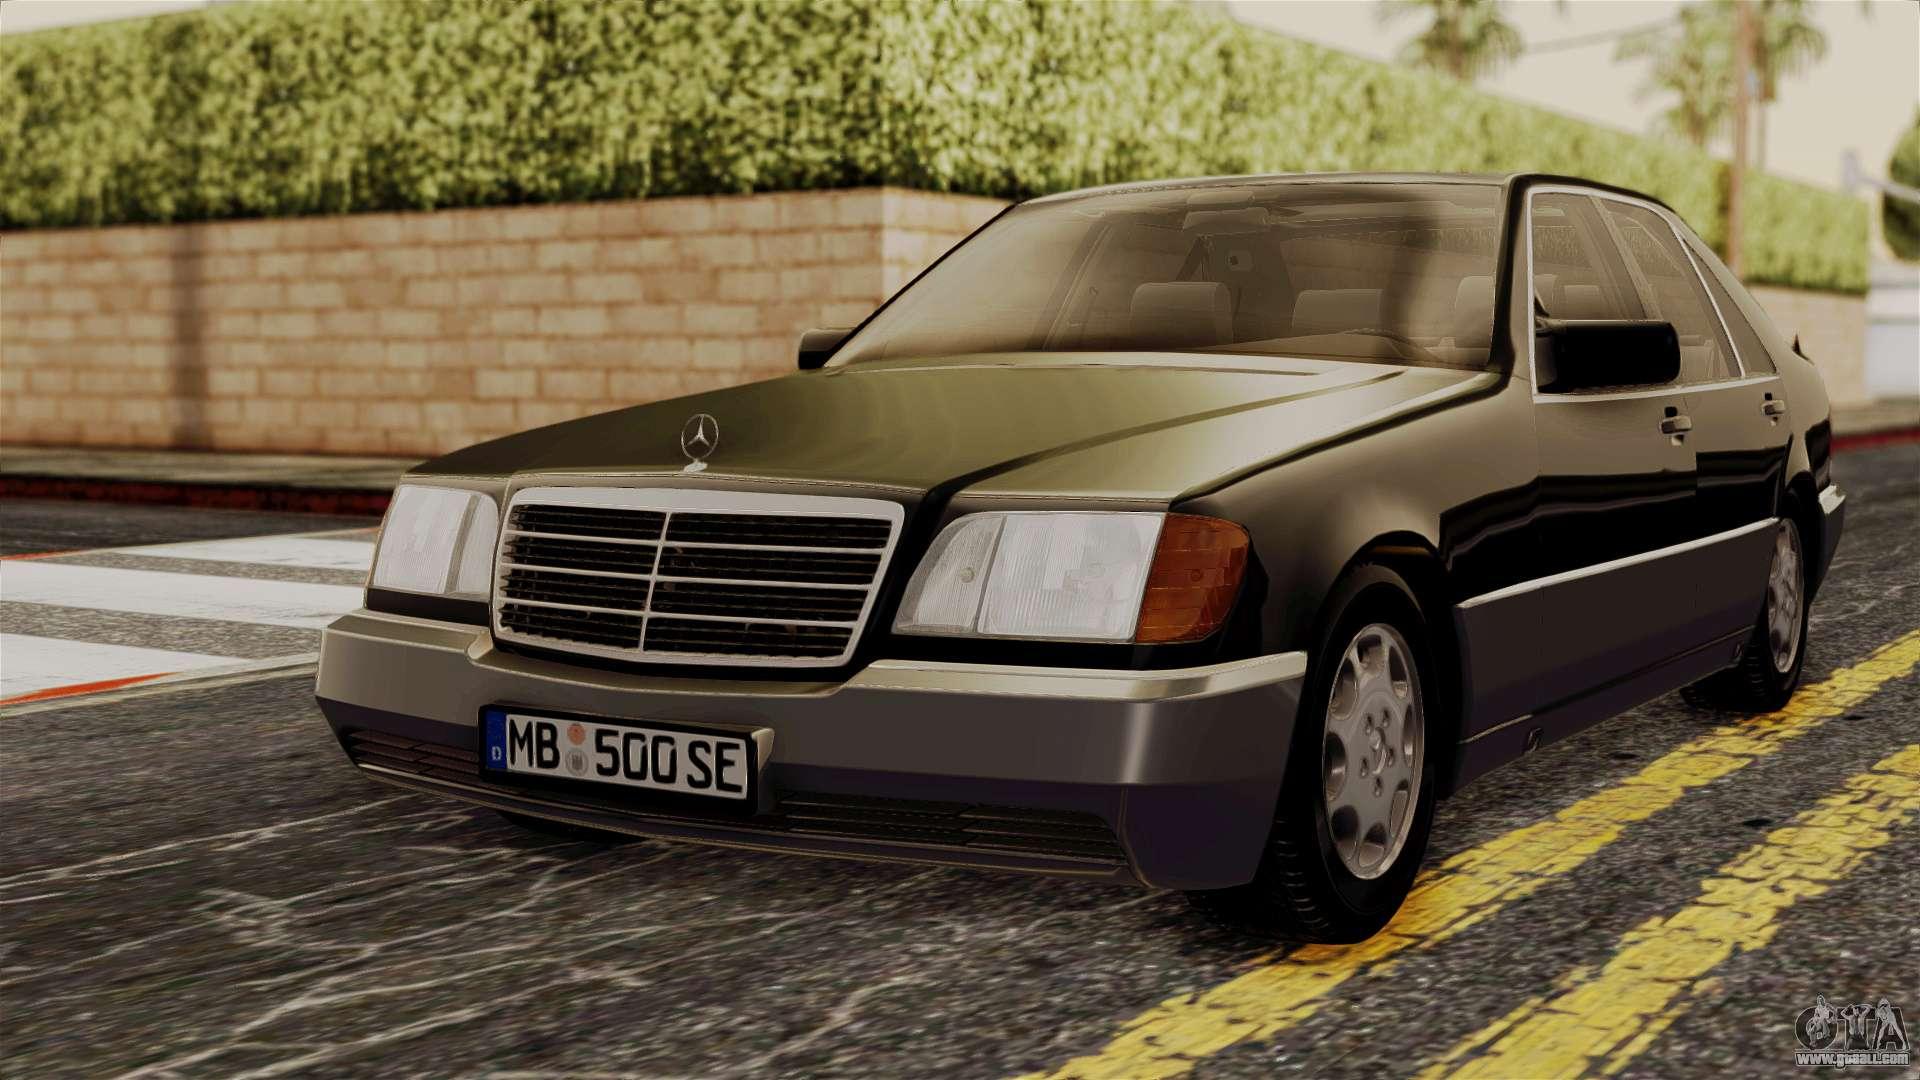 Mercedes benz w140 500se 1992 for gta san andreas for Mercedes benz 500se